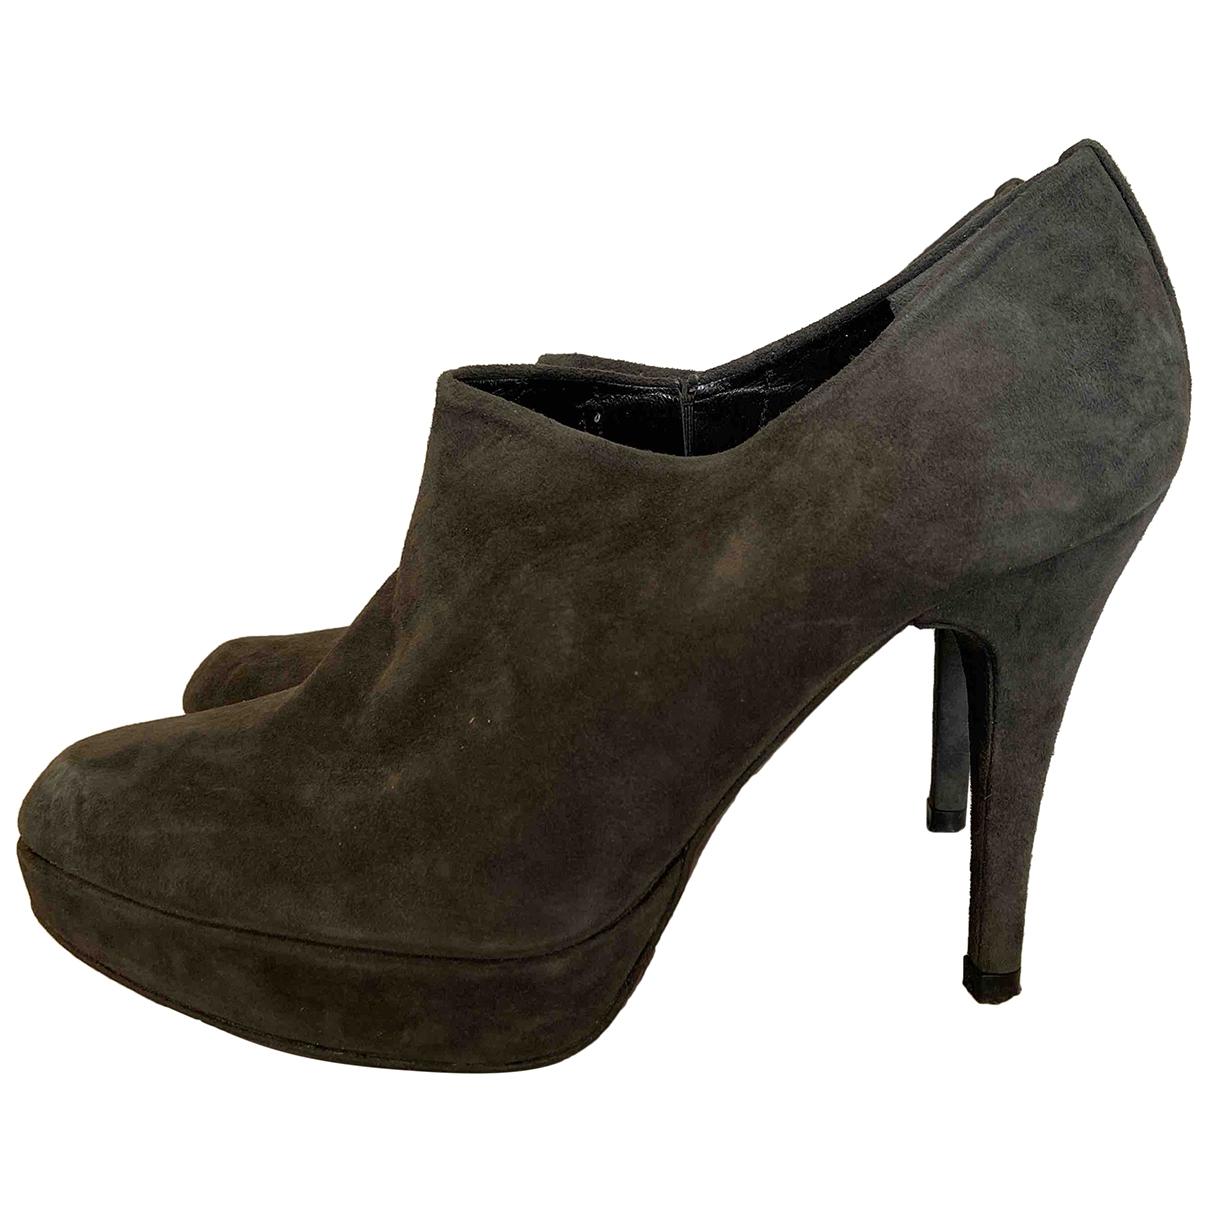 Stuart Weitzman \N Grey Suede Ankle boots for Women 36.5 EU